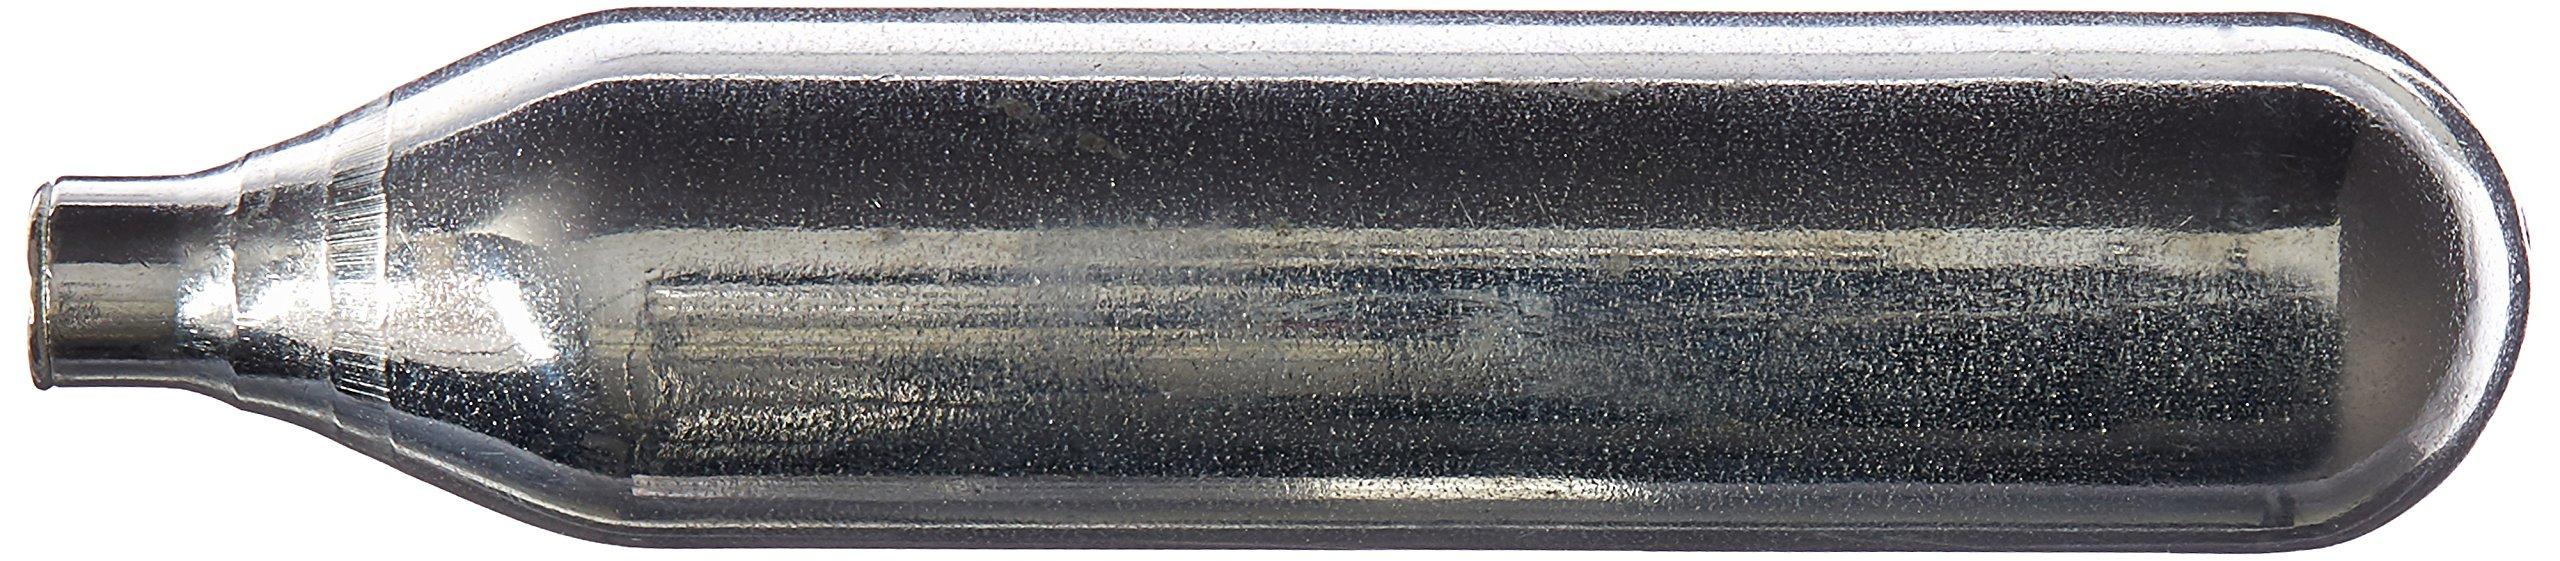 Firepower 12gm CO2 Catridge (20-Pack)